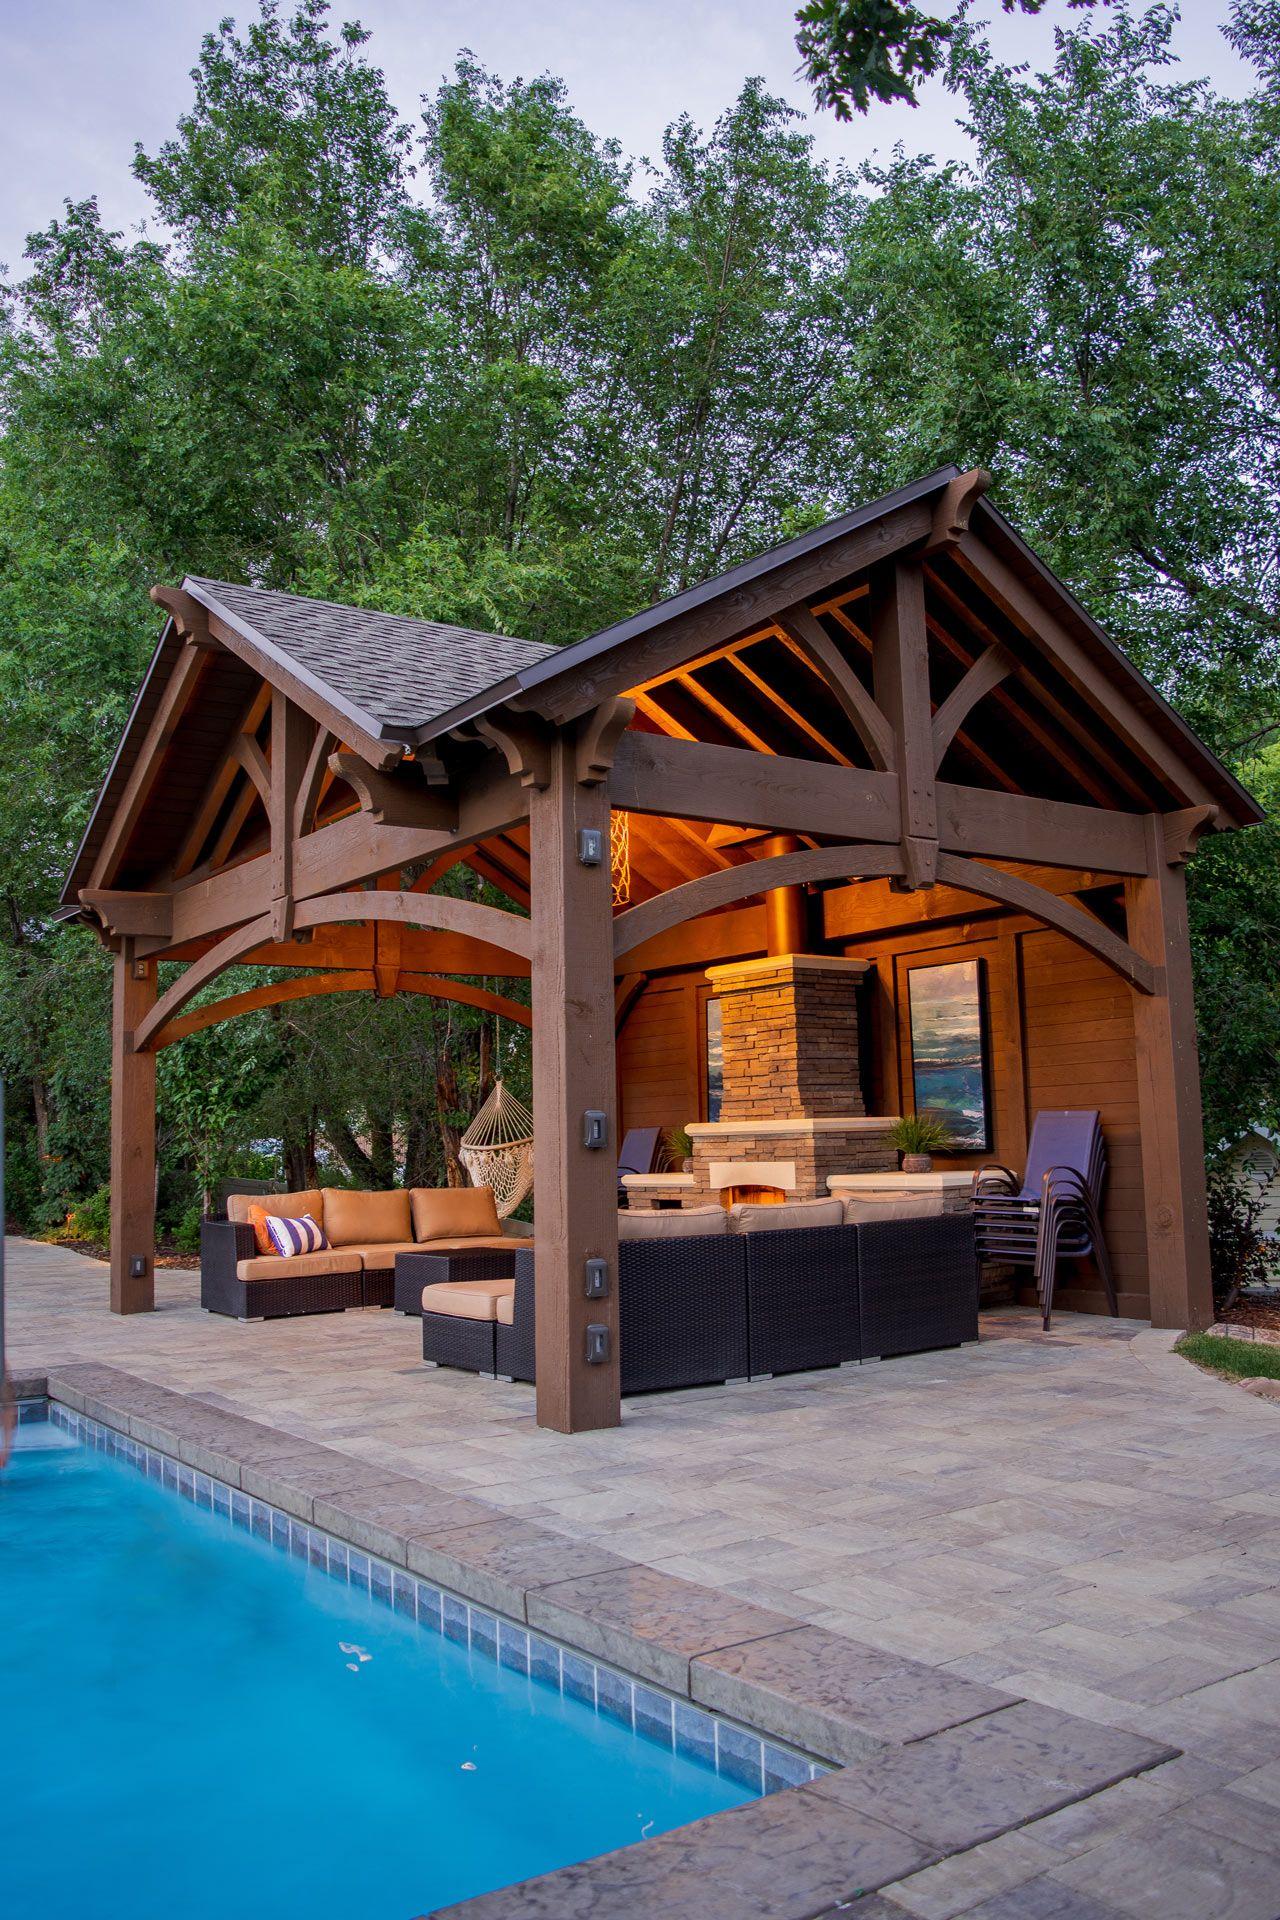 Home Backyard patio designs, Backyard pavilion, Outdoor